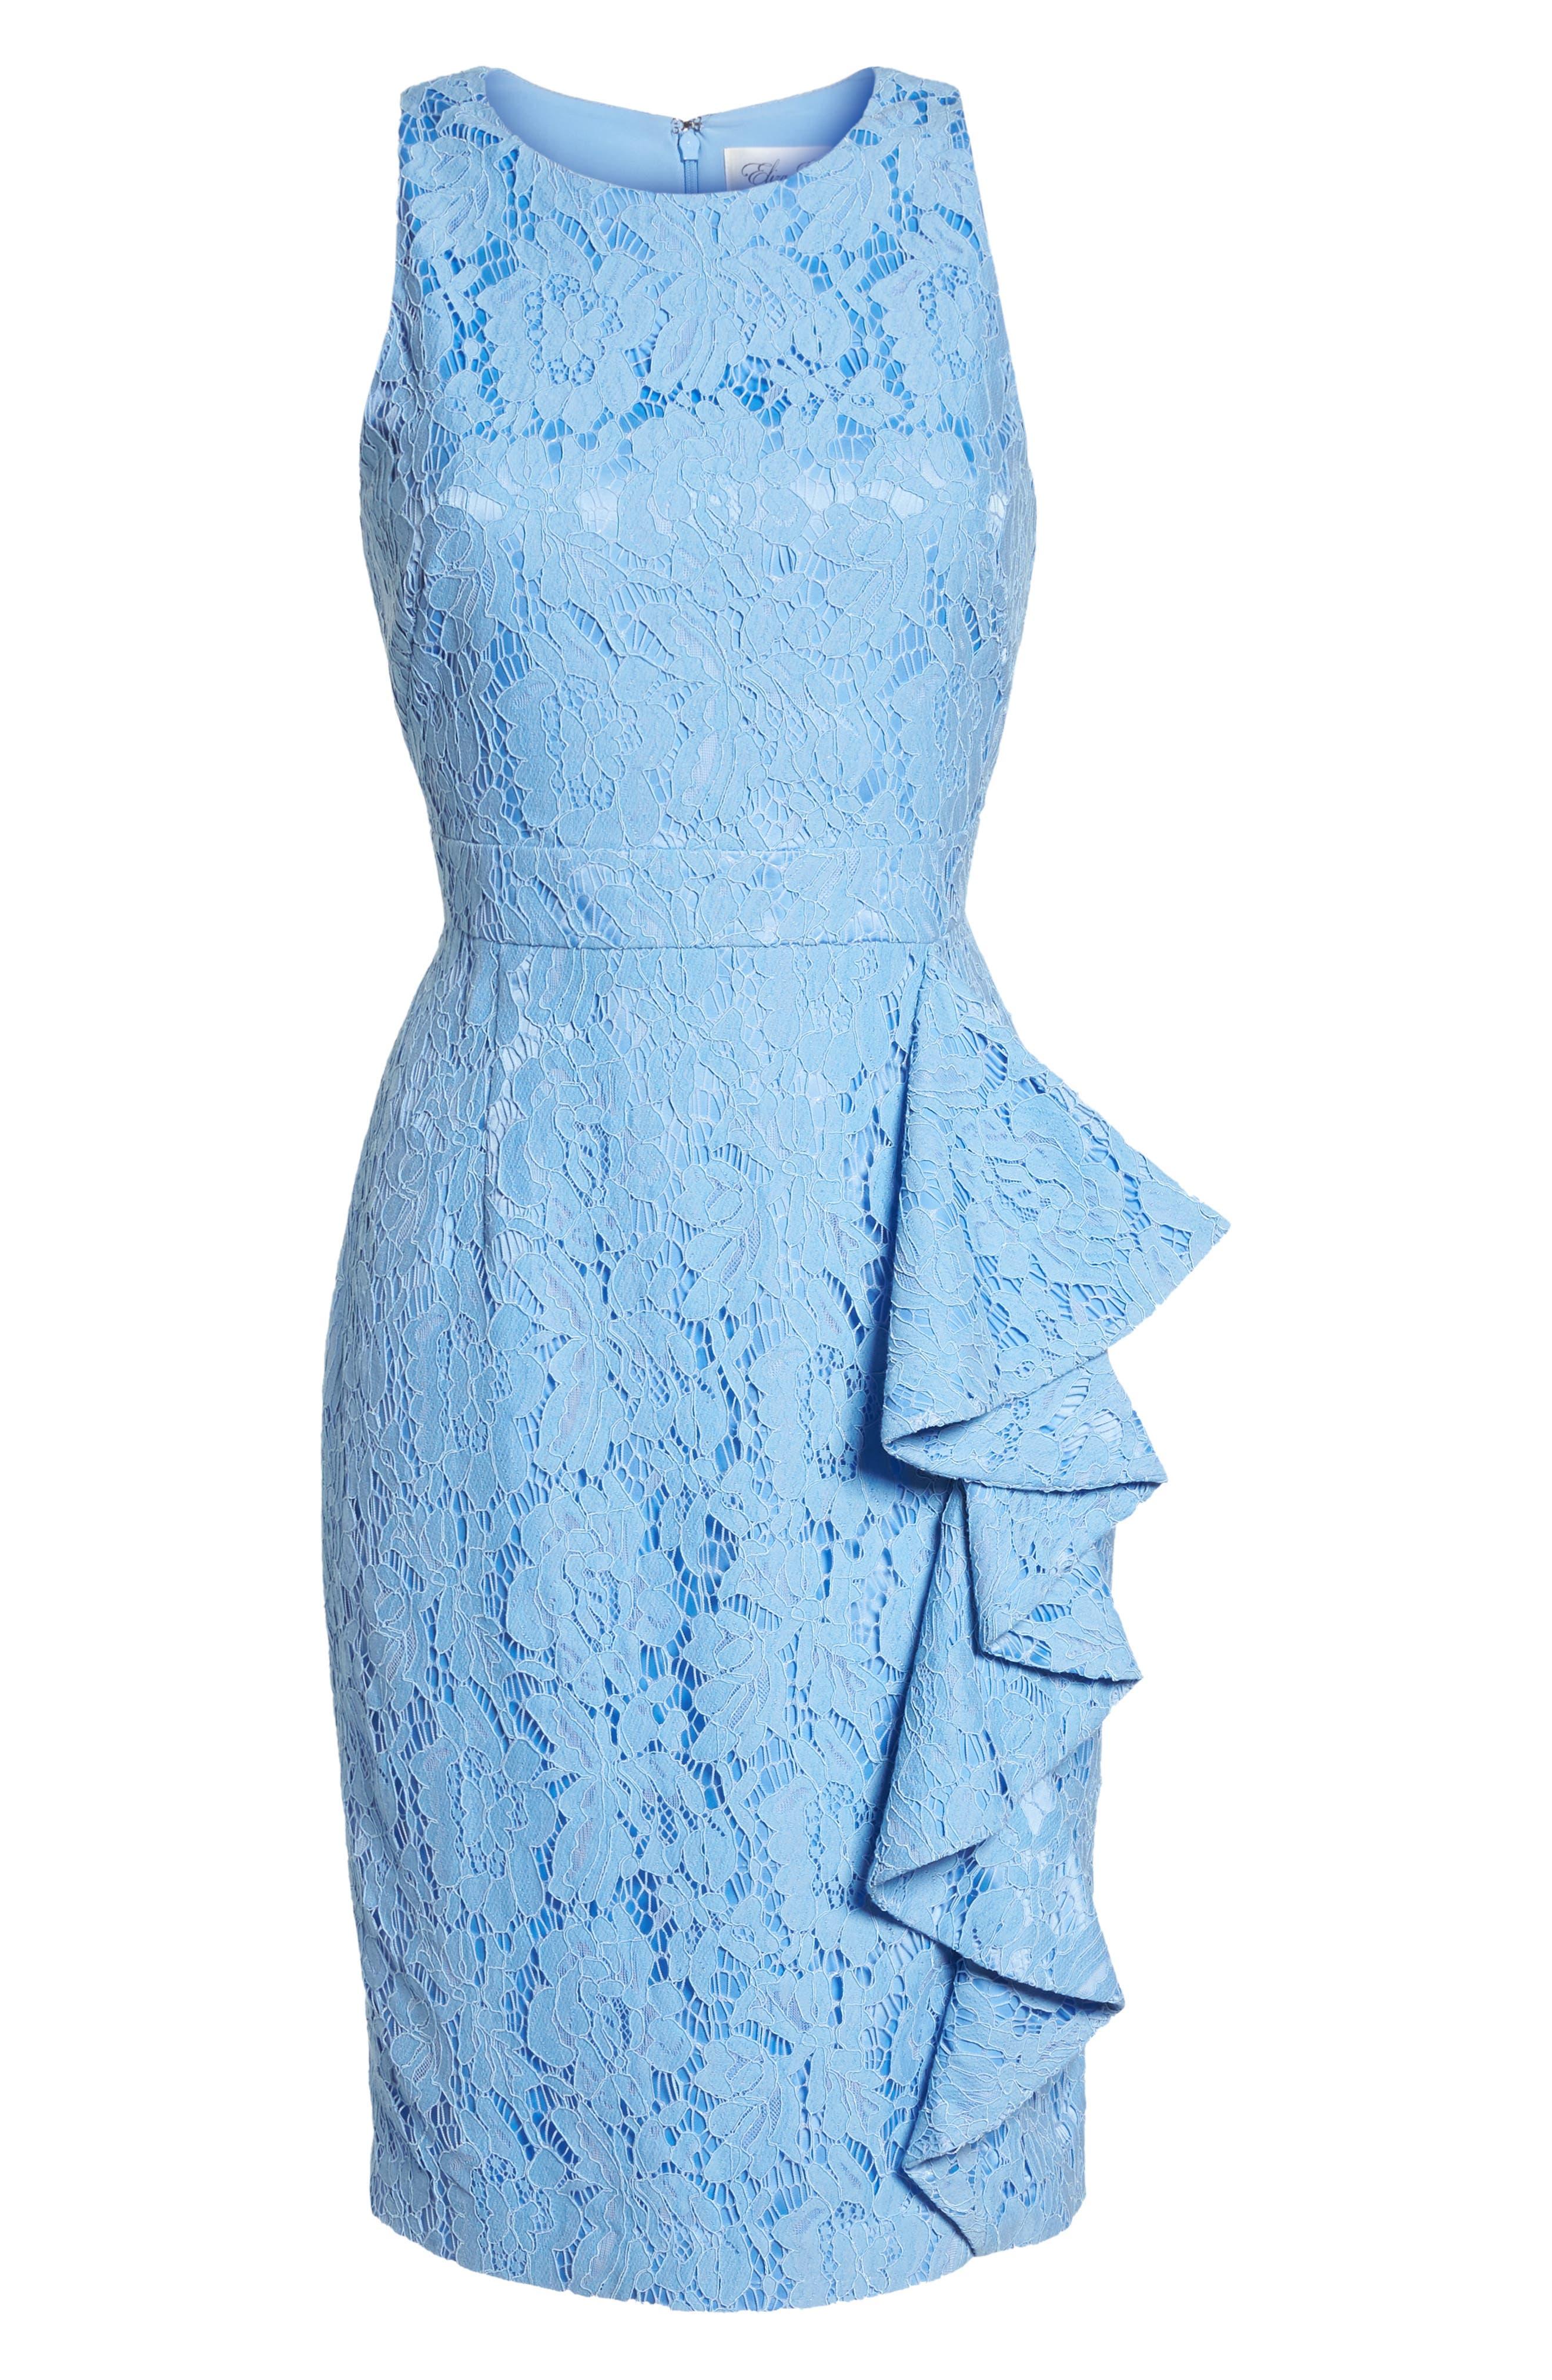 Sleeveless Ruffle Lace Sheath Dress,                             Alternate thumbnail 7, color,                             421